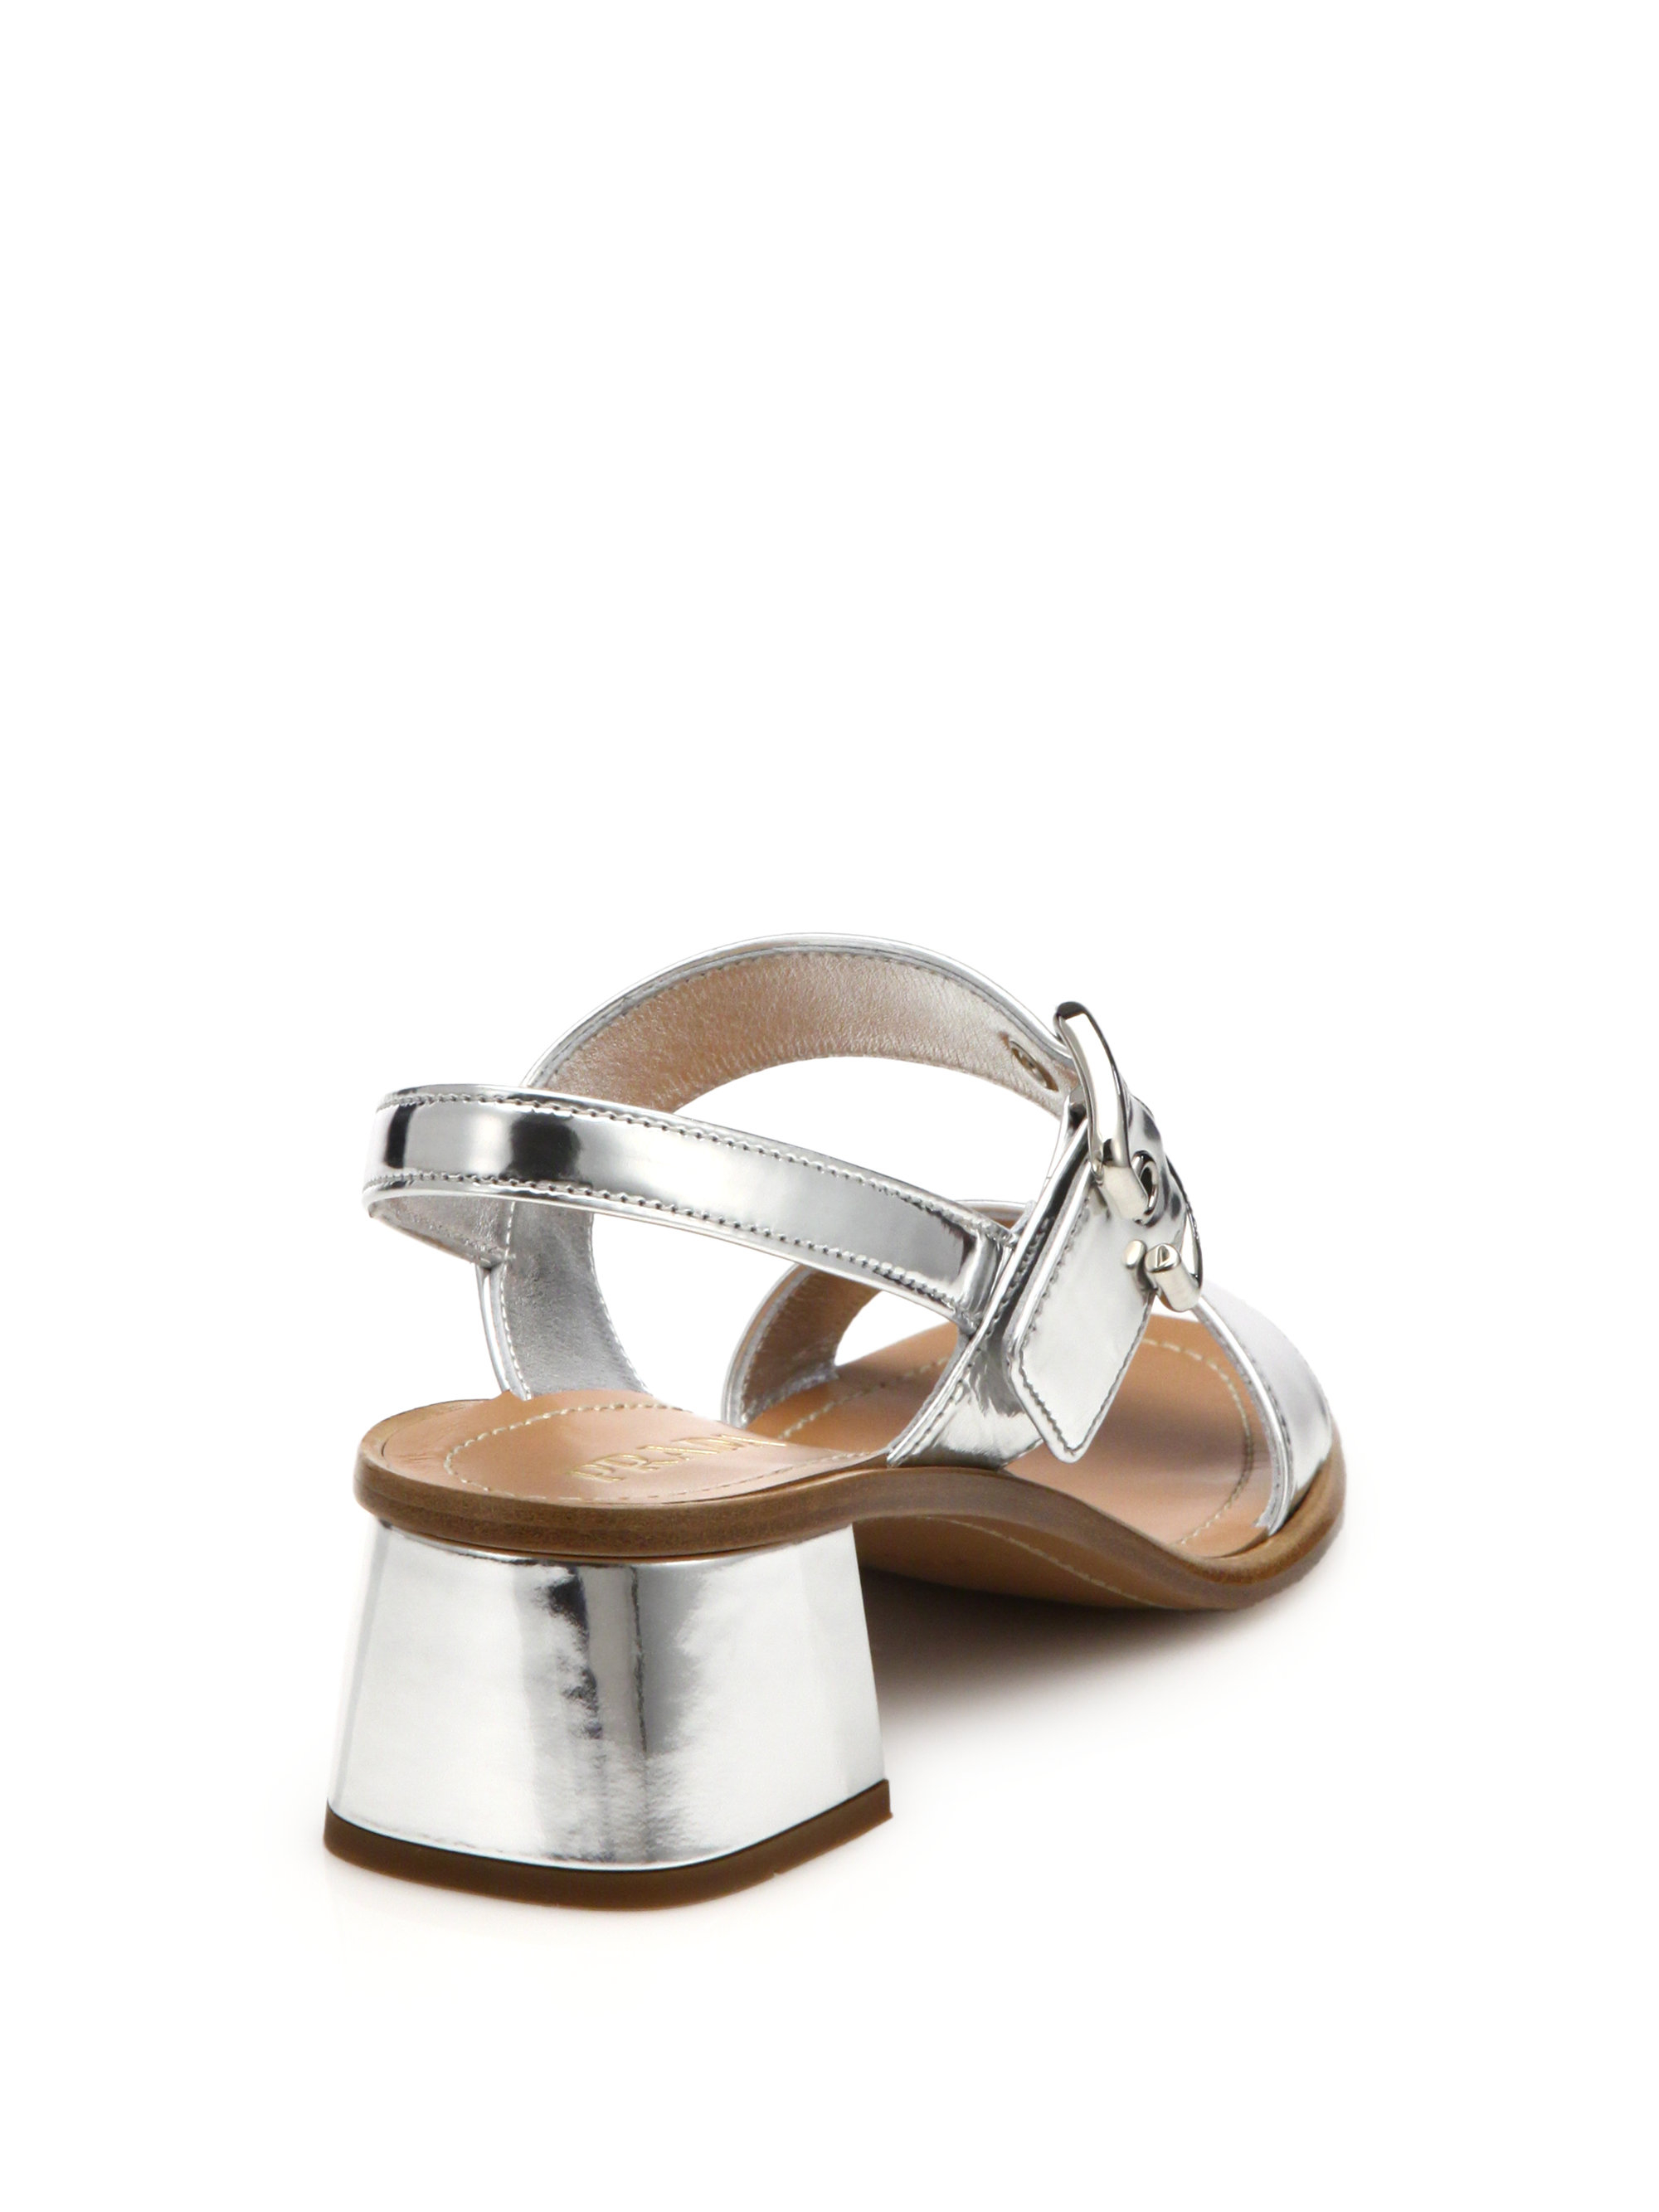 Prada Metallic Leather Low Block Heeled Sandals Lyst